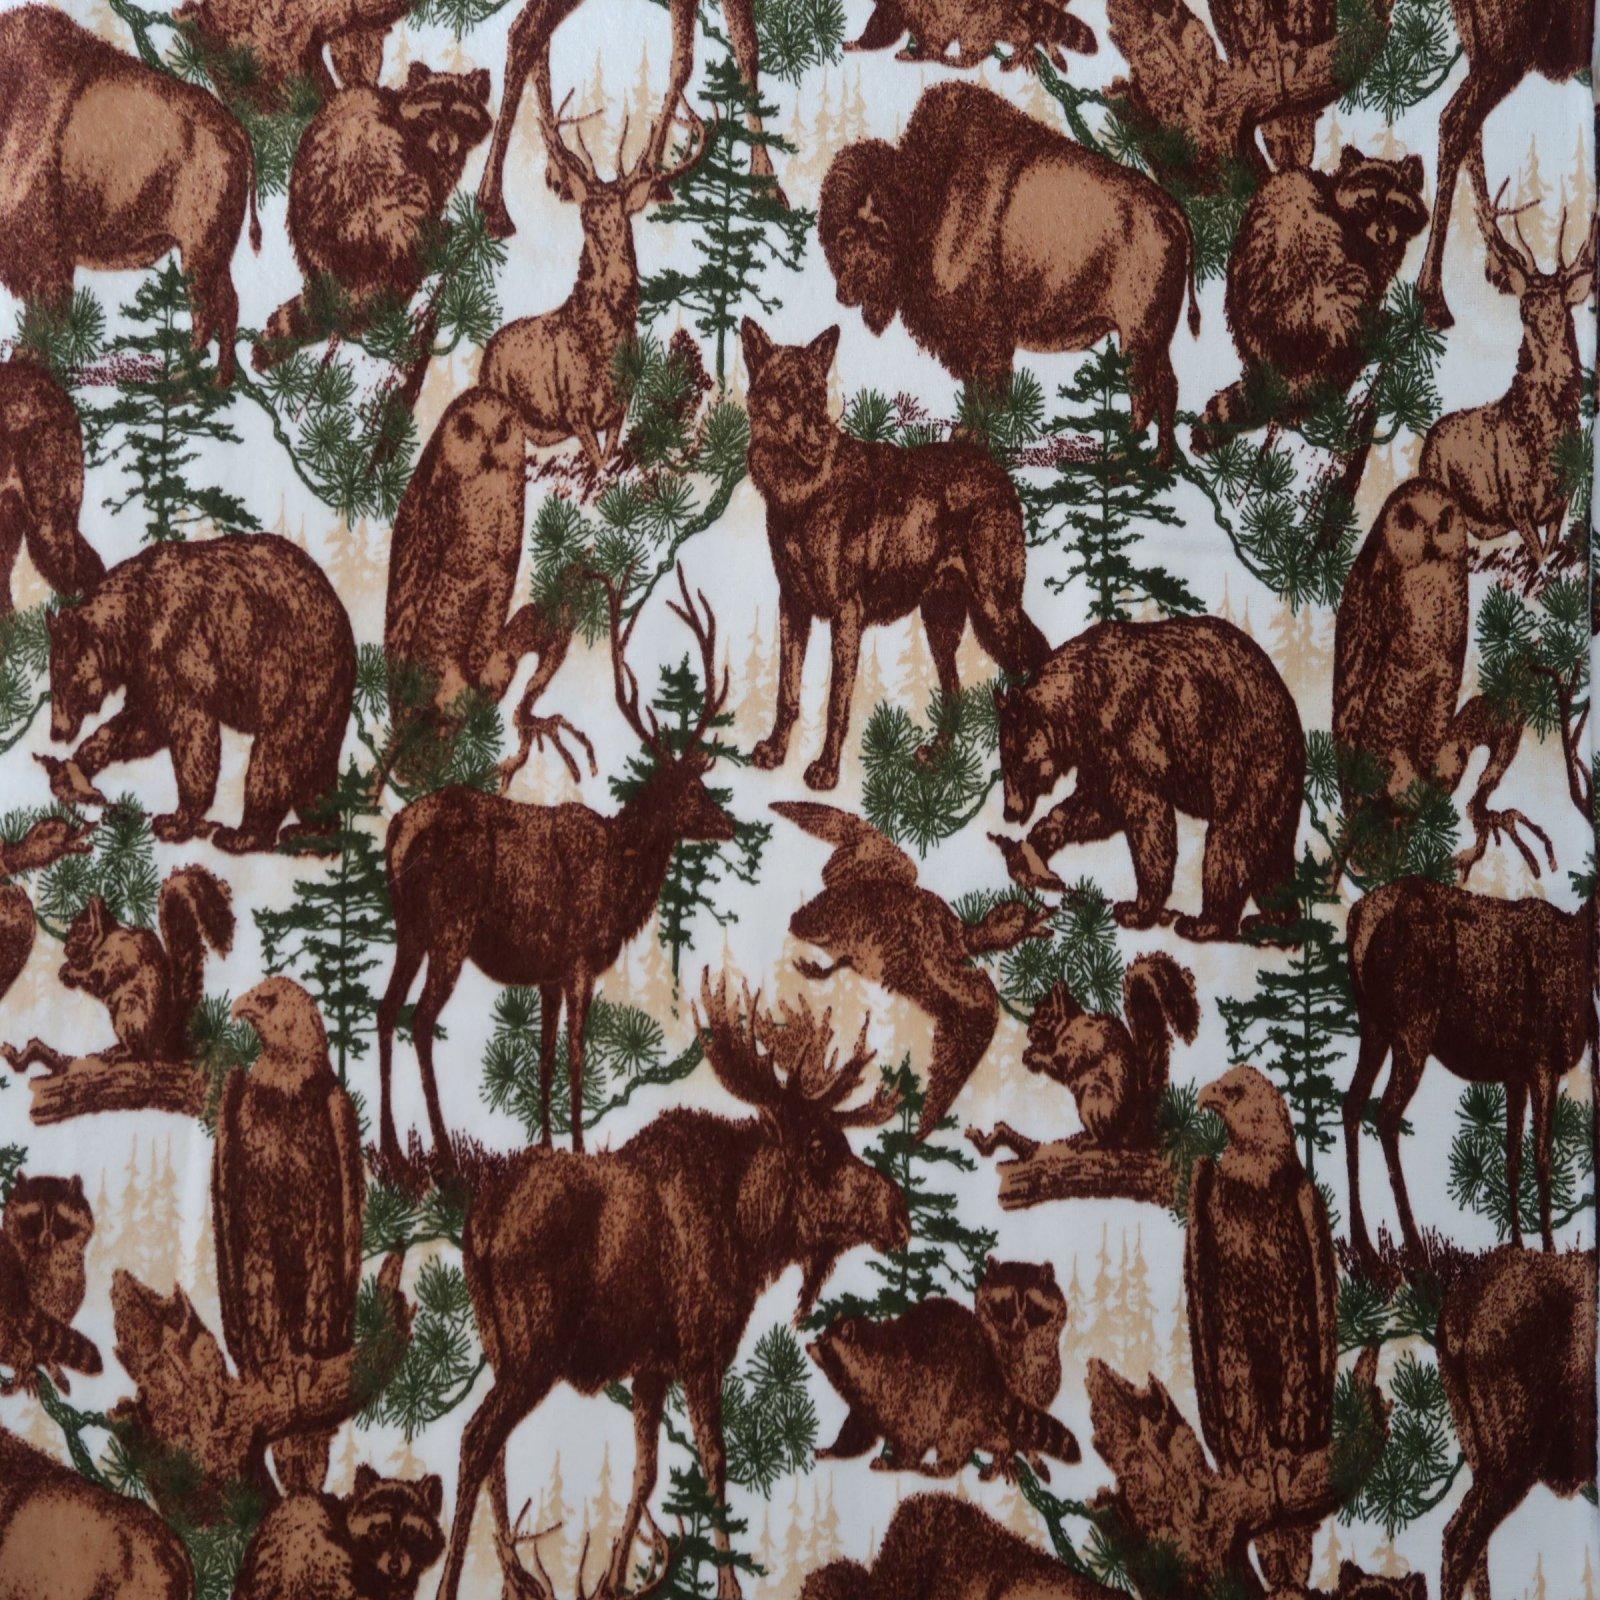 44-45 Wildlife Flannel by Robert Kaufman